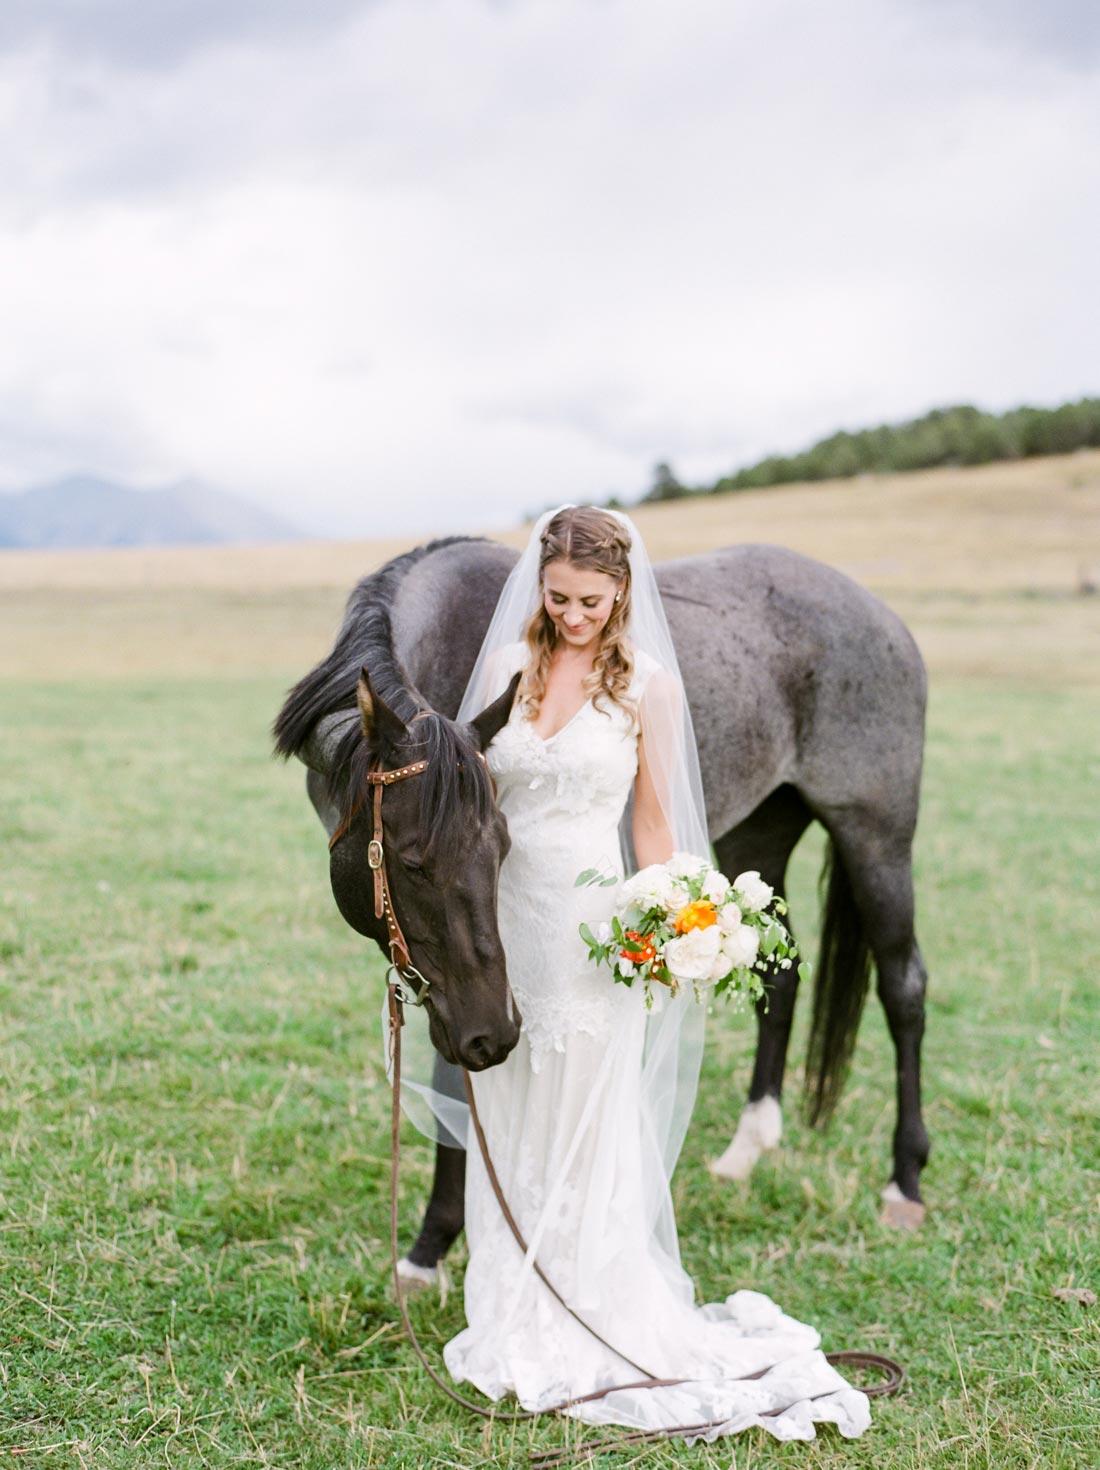 Megan_Zack_Cedar_Ridge_Ranch_Wedding_by_Connie_Whitlock_web_363.jpg